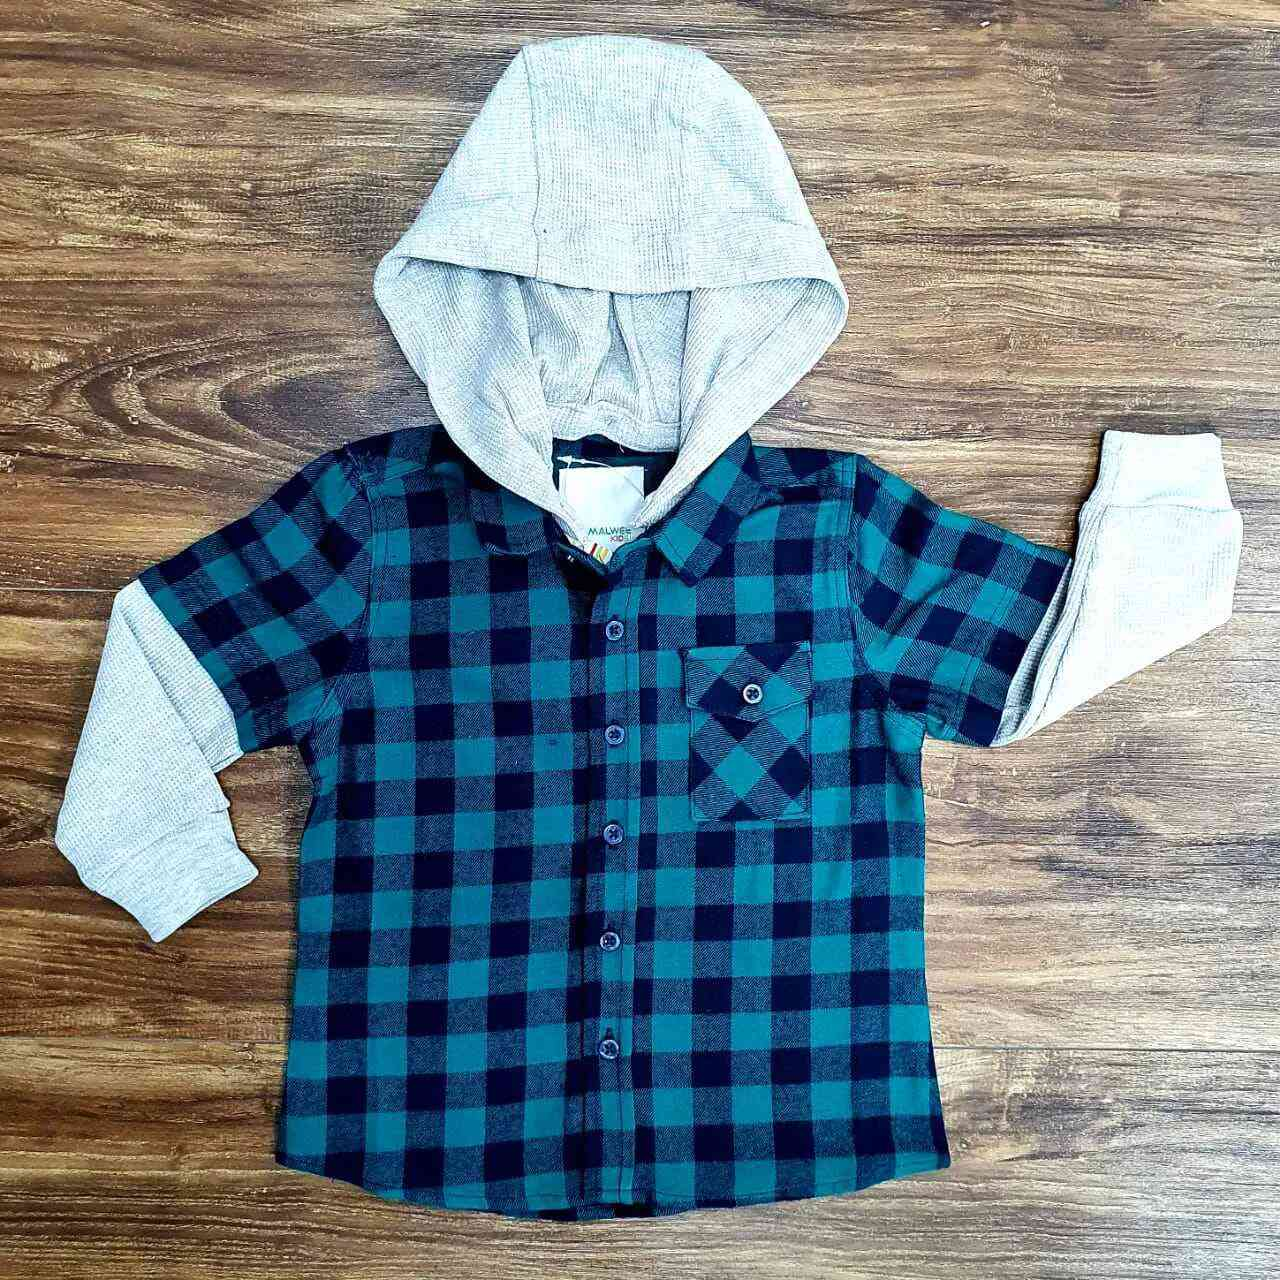 Camisa Quadriculada com Capuz